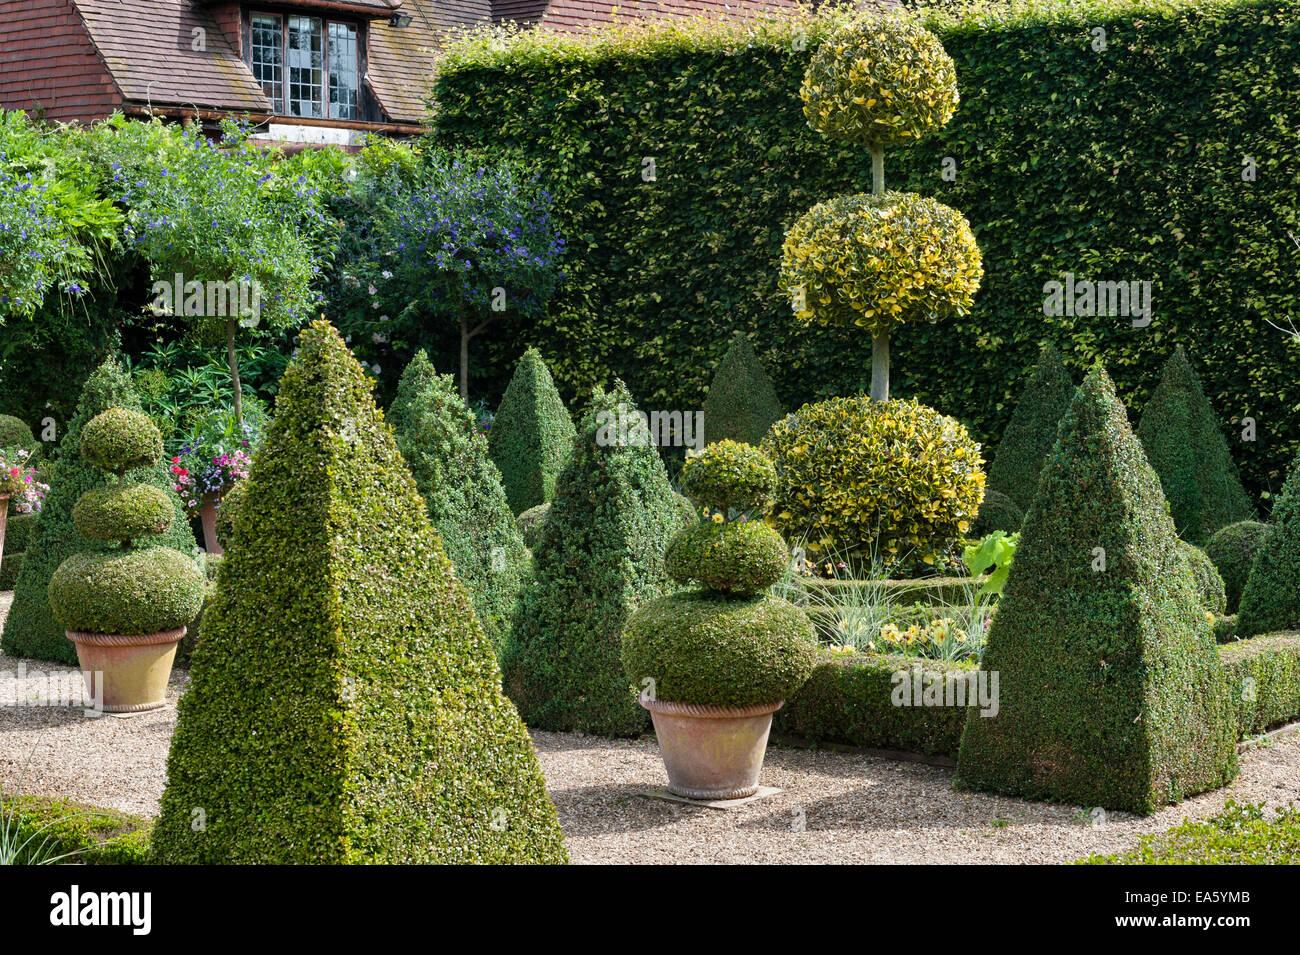 East Ruston Old Vicarage gardens, Norwich, Norfolk, UK. The Dutch Garden - Stock Image